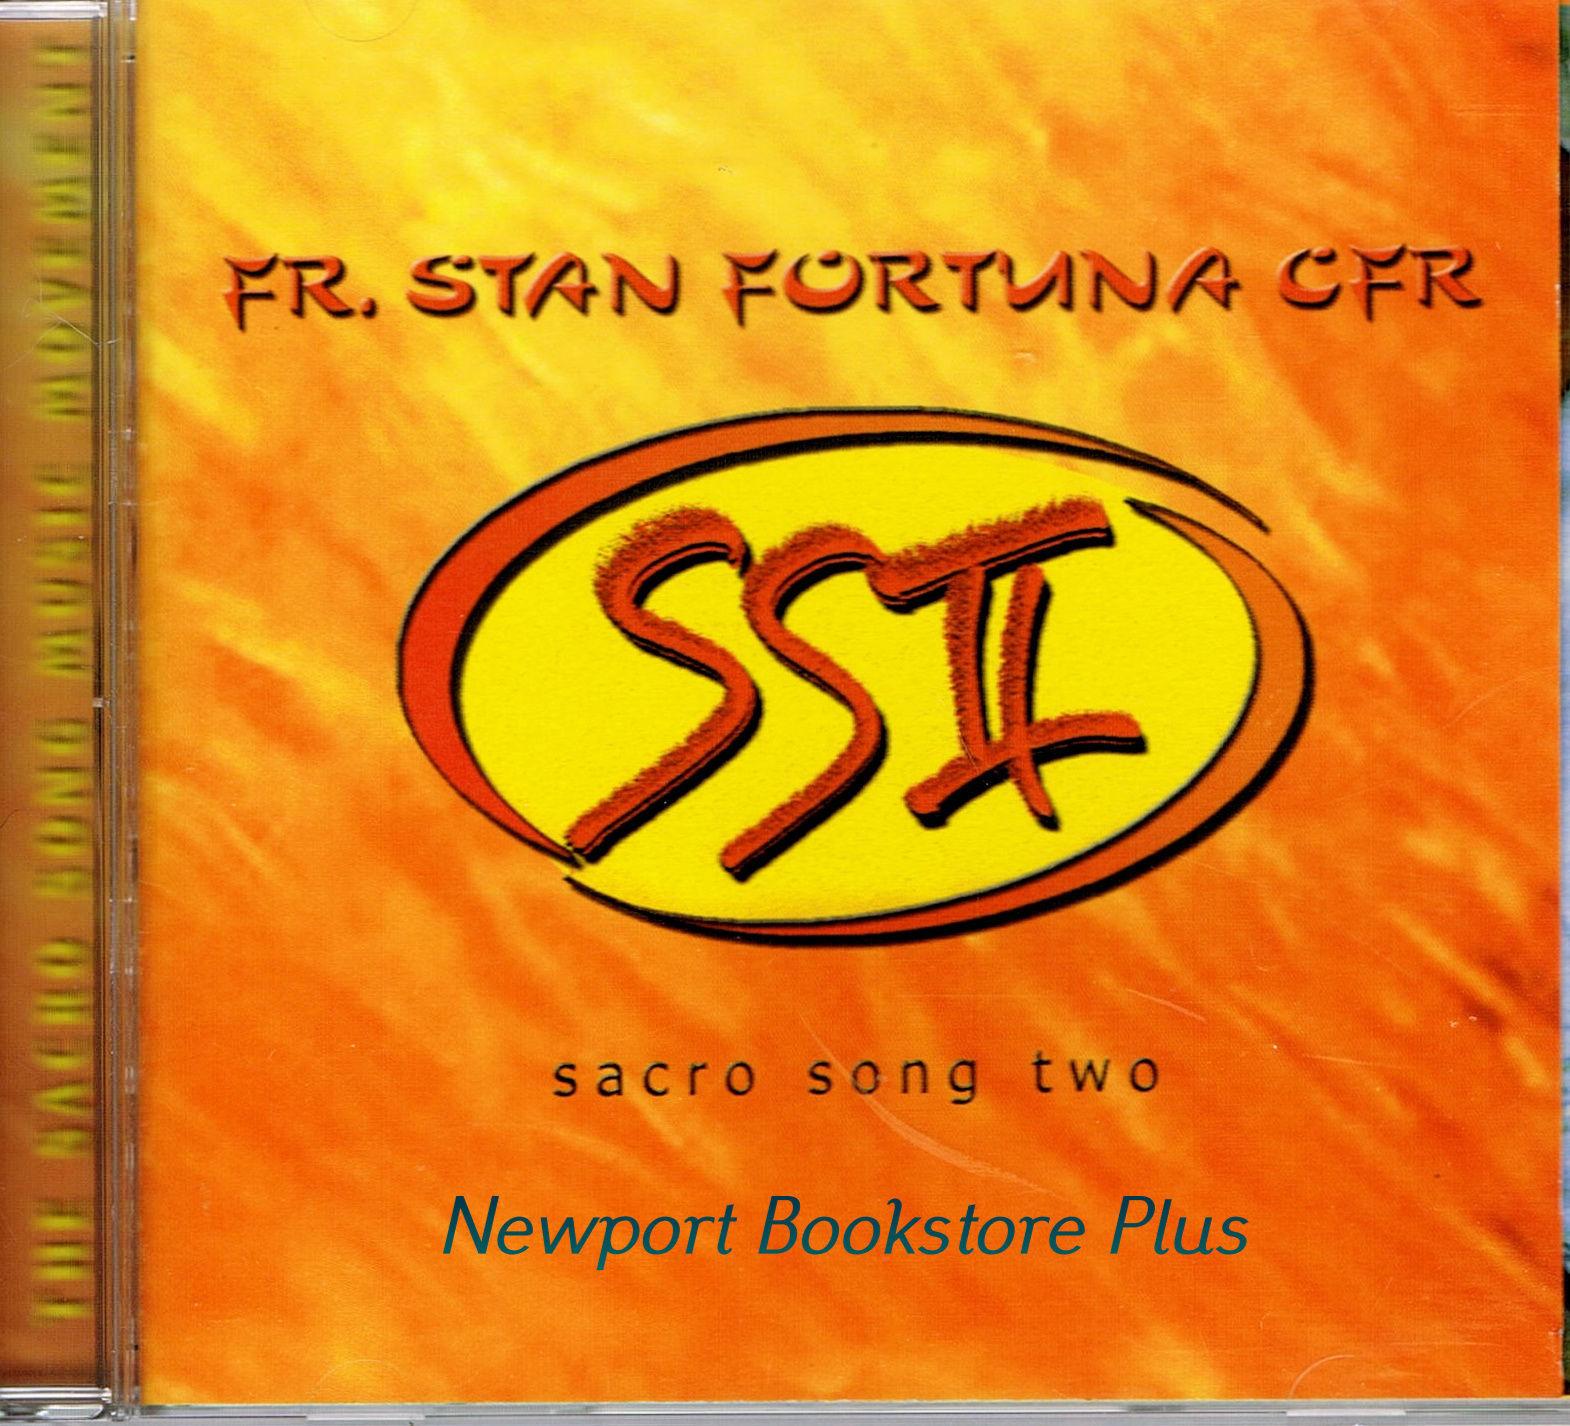 Sacro song ii by fr stan fortuna c.f.r